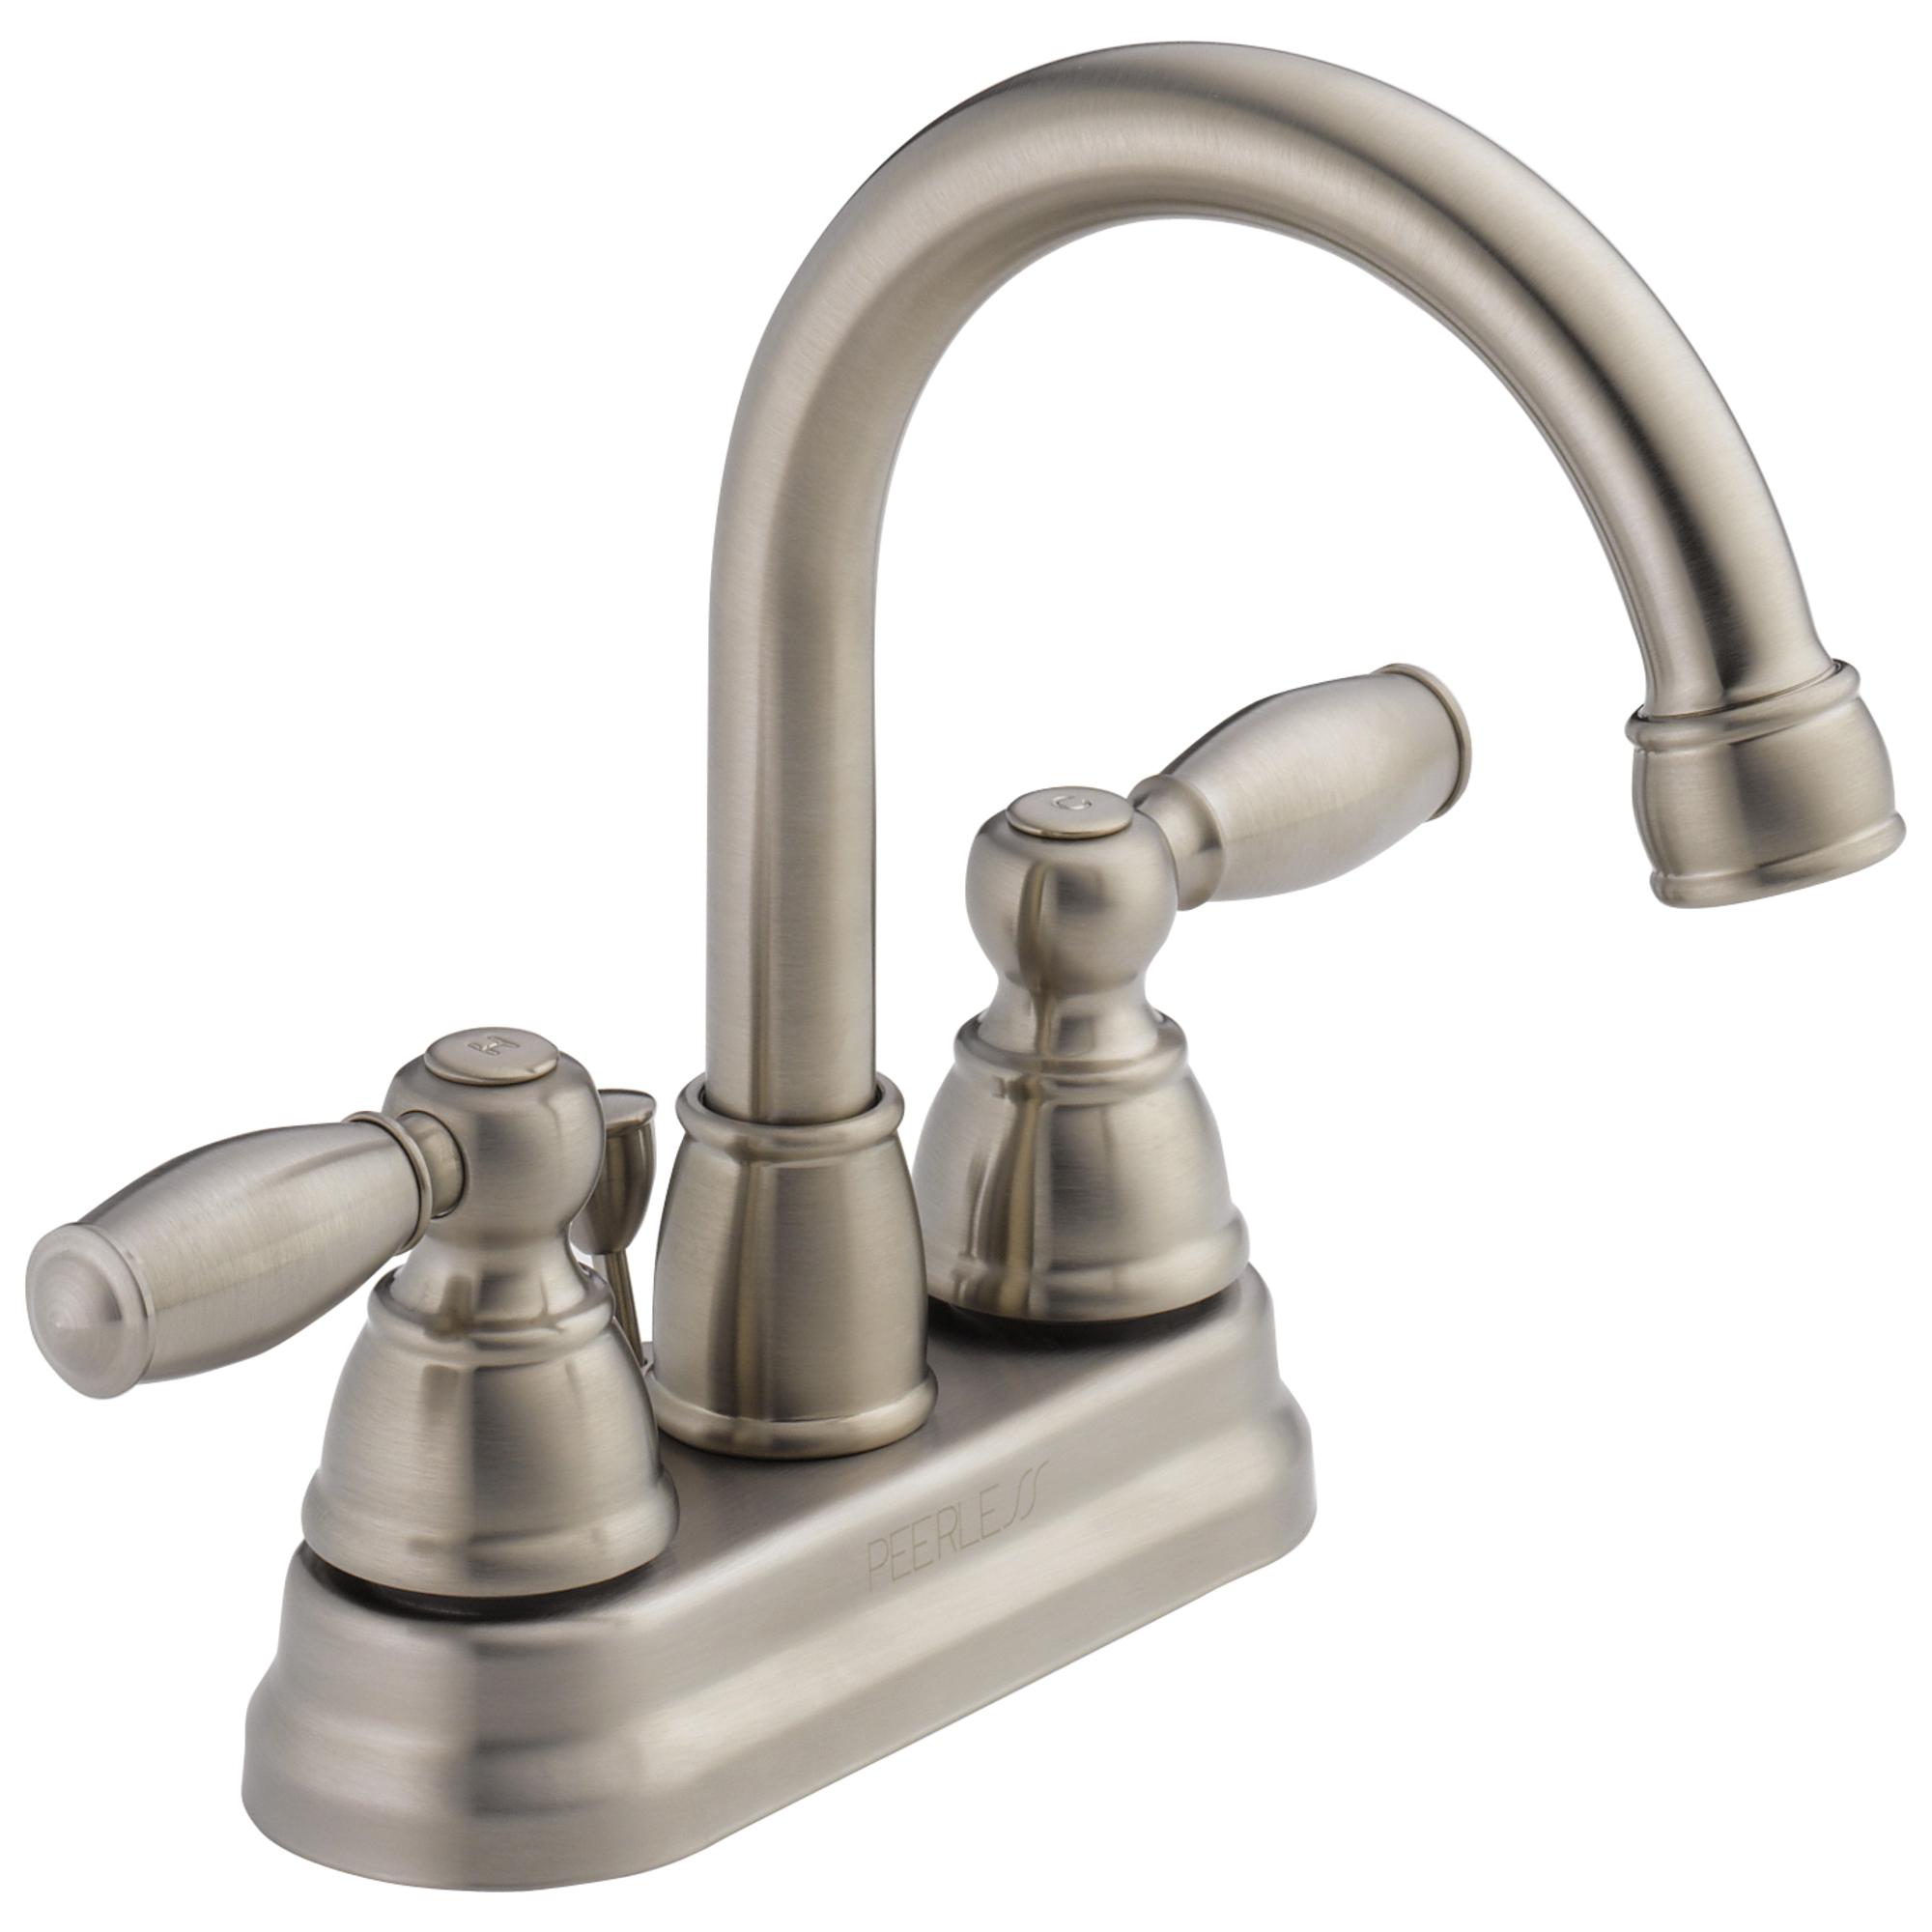 Peerless® P299685LF-BN Centerset Lavatory Faucet, Brilliance® Brushed Nickel, 2 Handles, Pop-Up Drain, 1.2 gpm